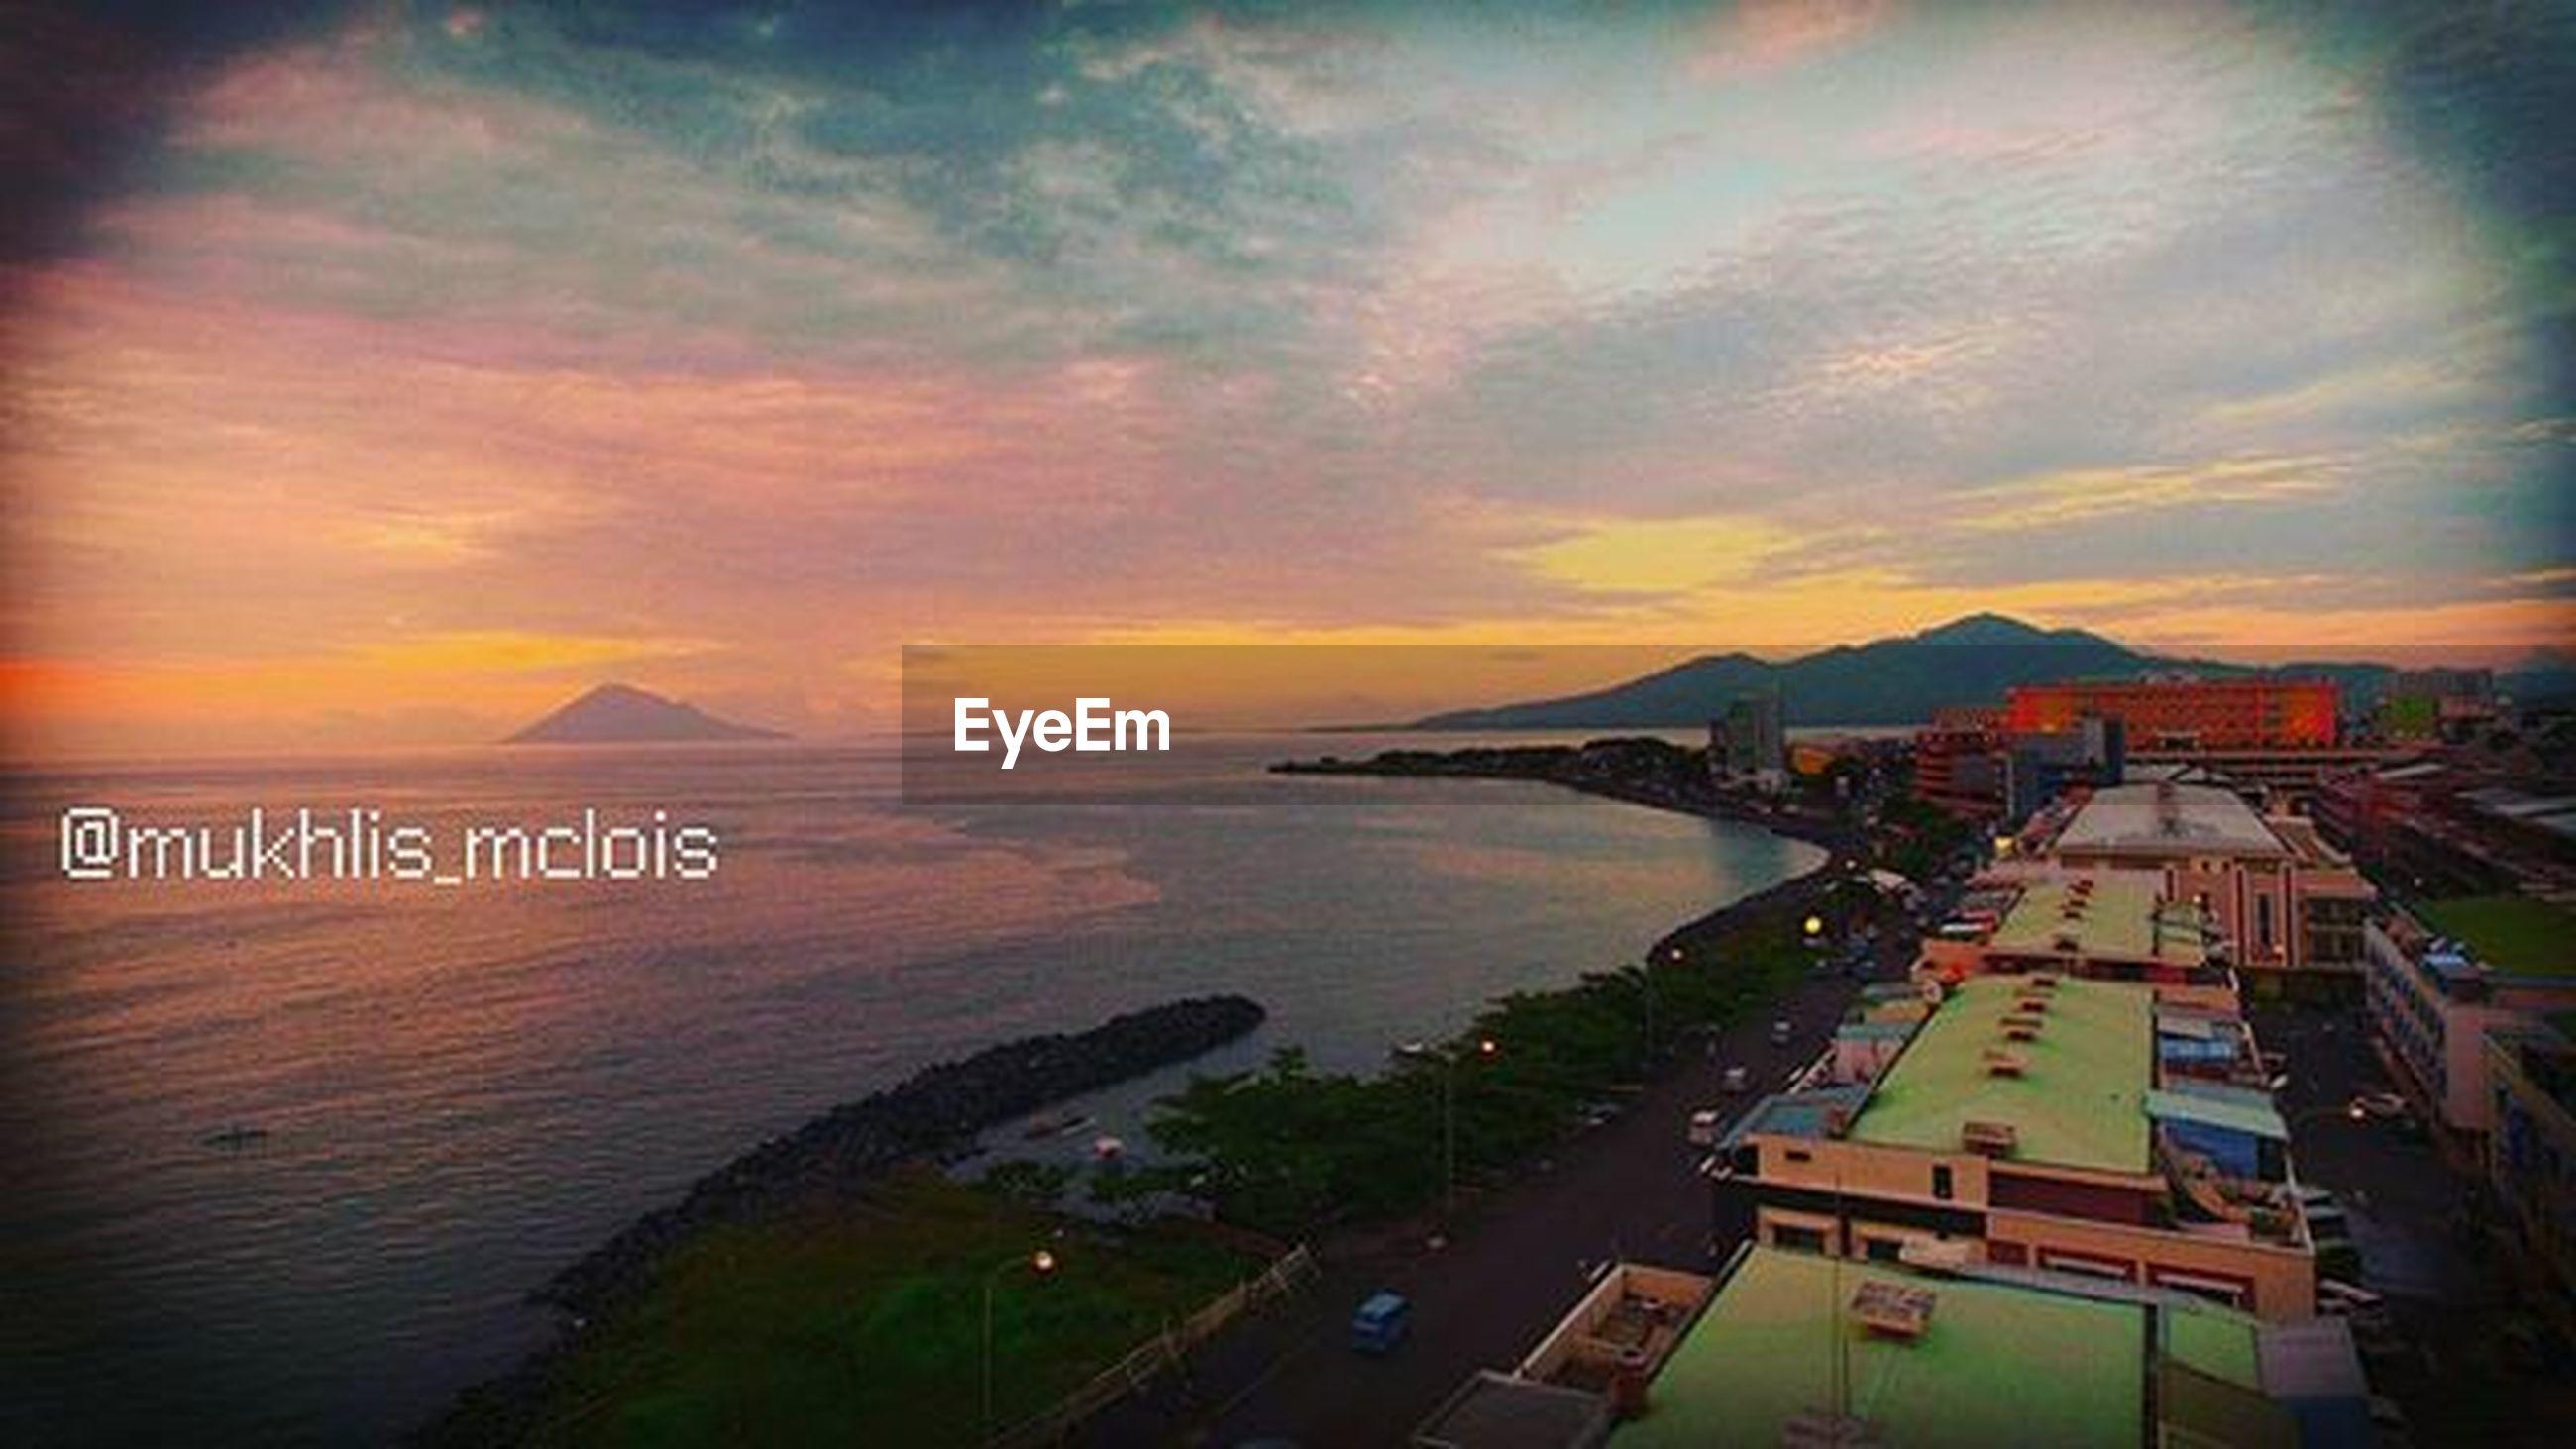 sunset, sea, sky, water, built structure, architecture, horizon over water, cloud - sky, orange color, scenics, building exterior, beach, beauty in nature, tranquil scene, nature, tranquility, shore, cloudy, cloud, idyllic